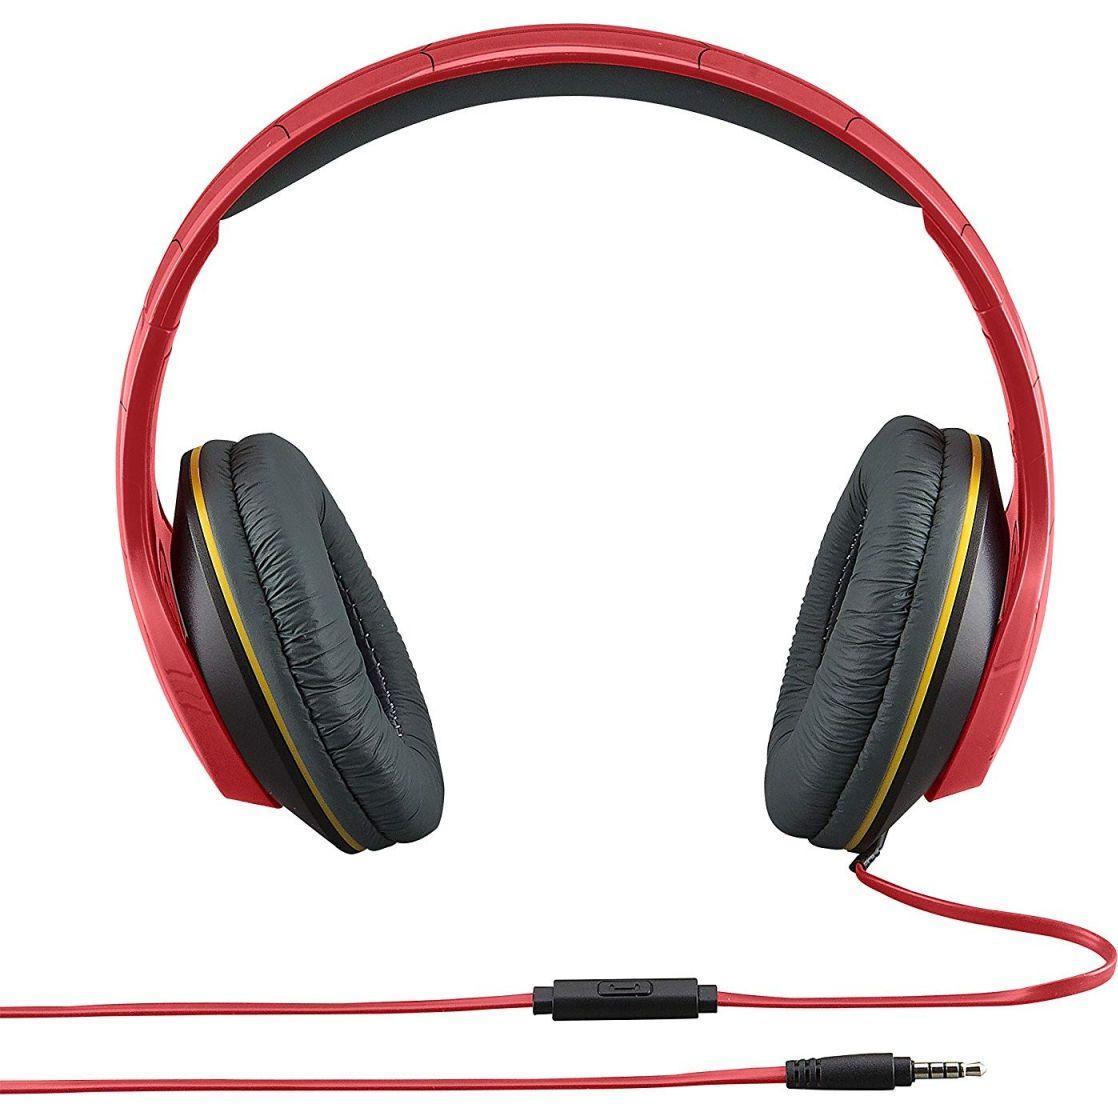 Дитячі навушники Людина павук 2 eKids iHome VI-M40SM.11XV7 3bcba7fcd22bd